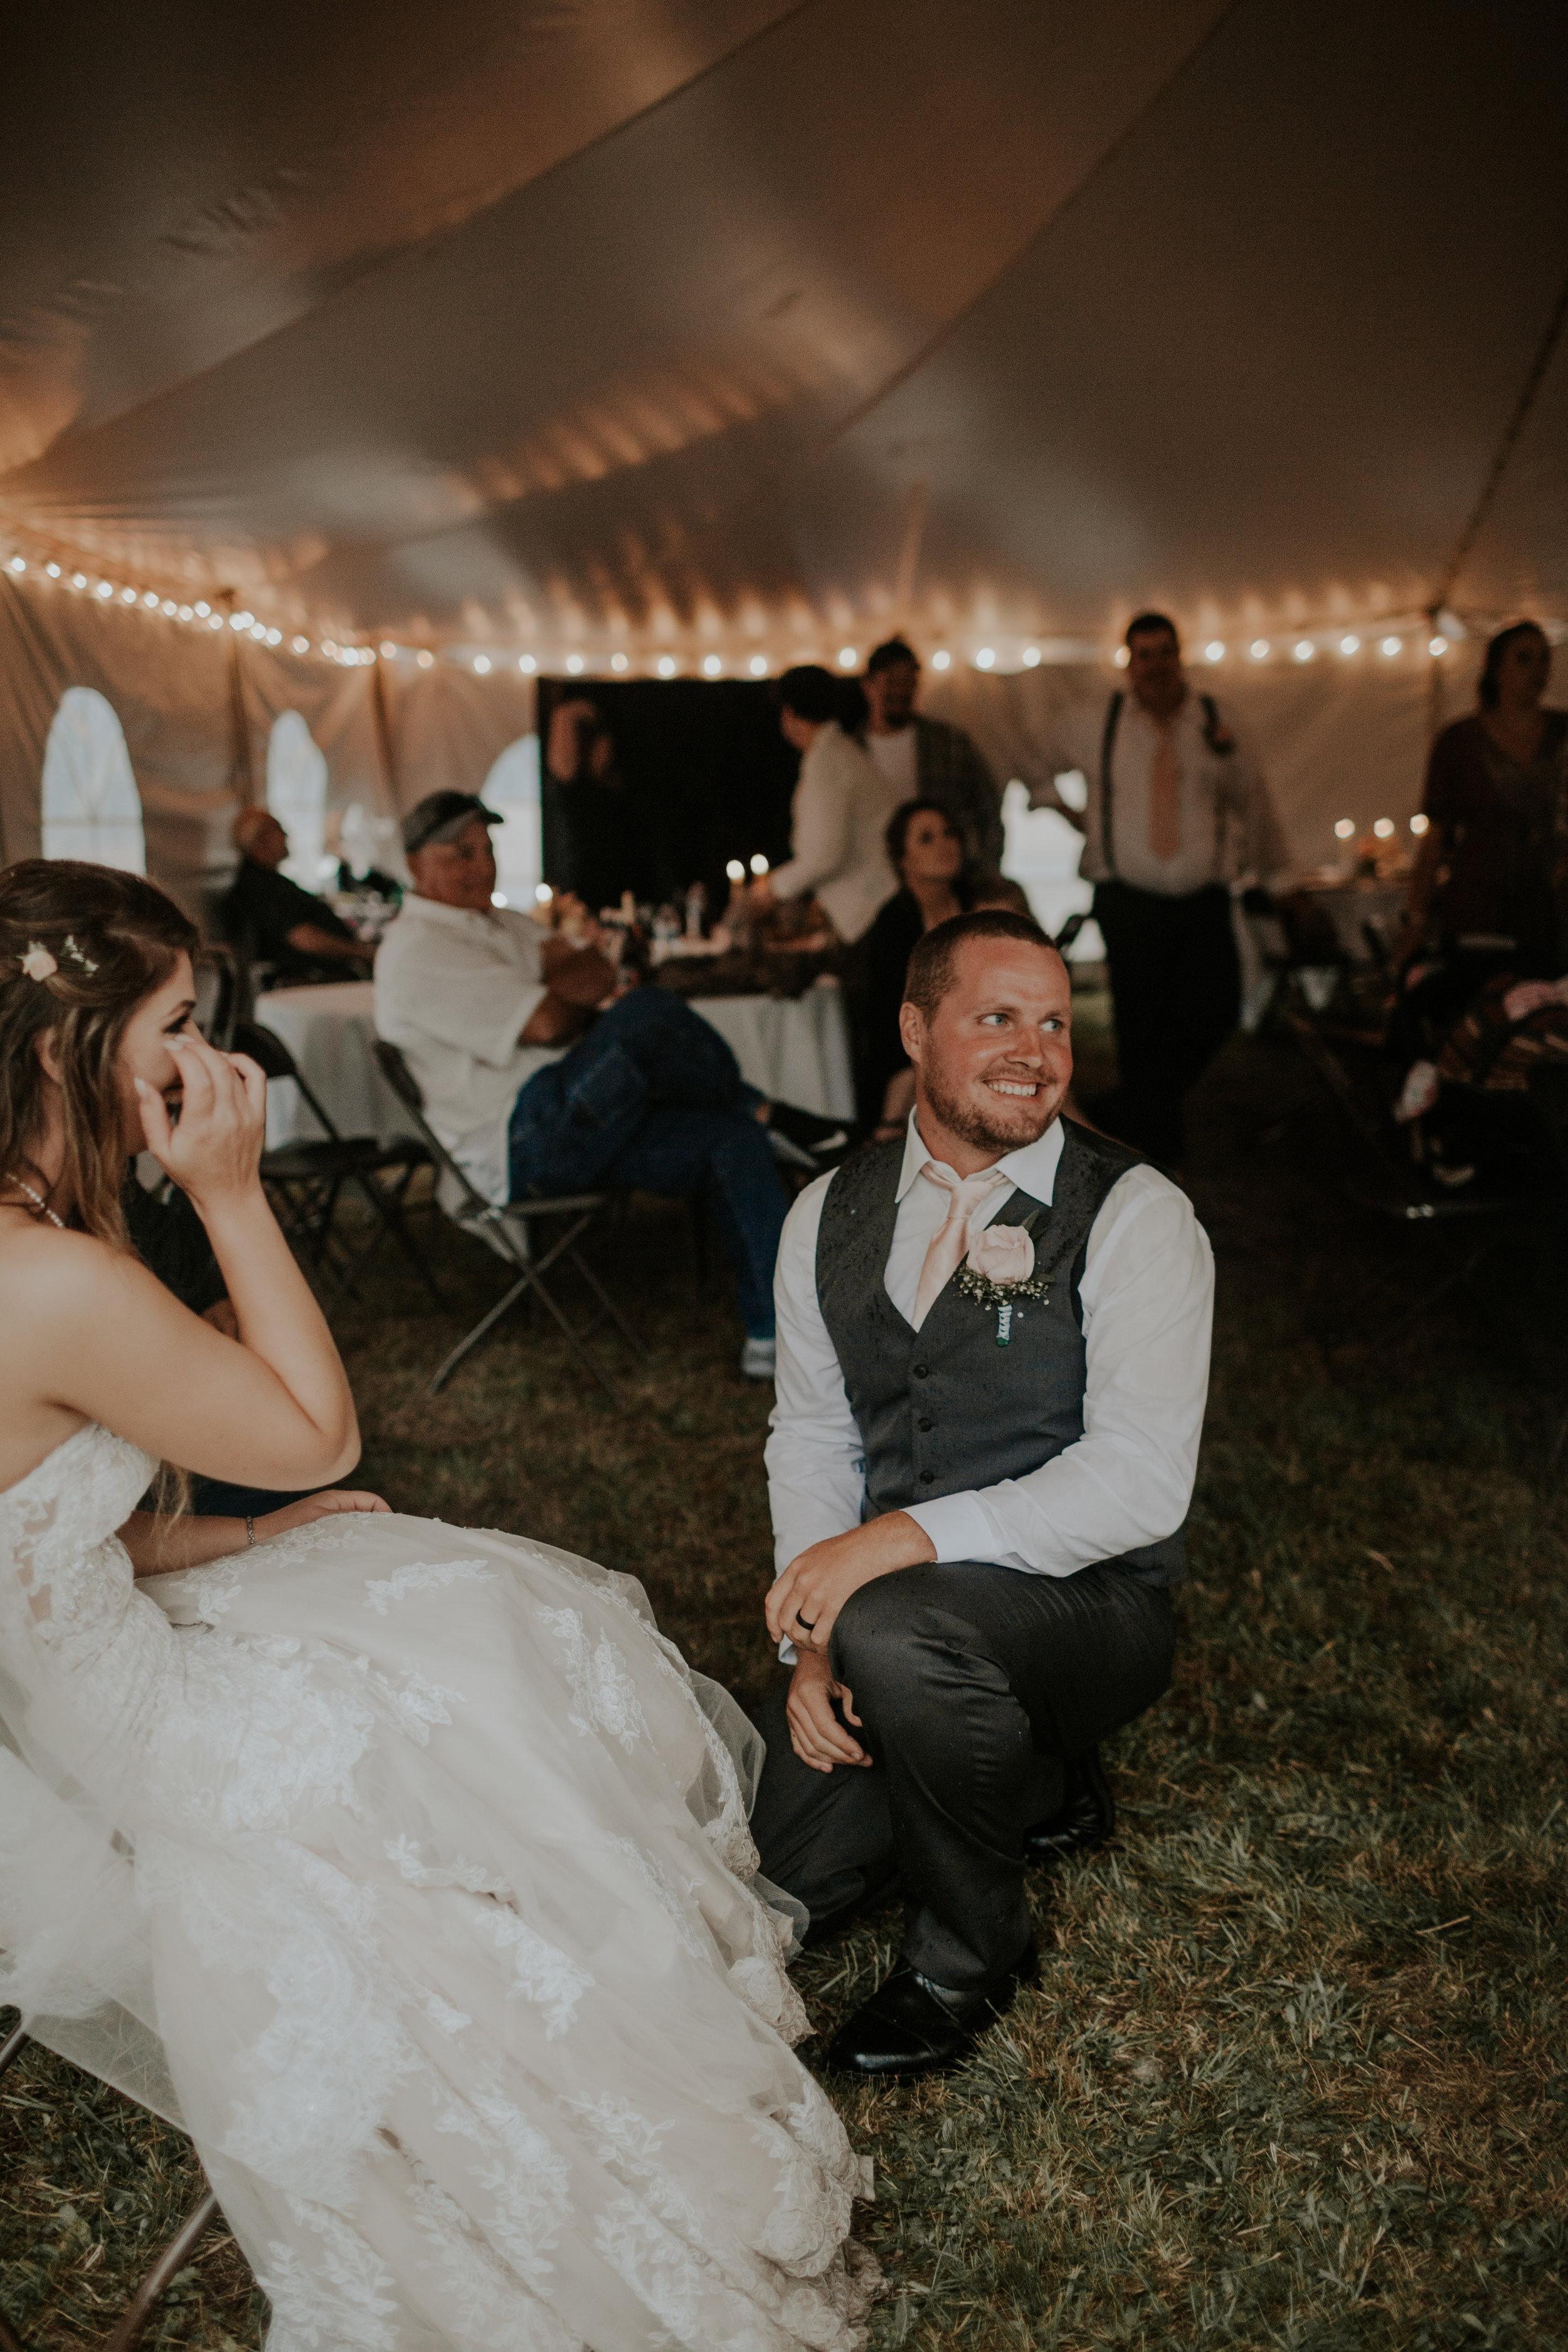 Olympic-Peninsula-Wedding-Photographer-PNW-Forks-Port-Angeles-Kayla-Dawn-Photography-engagement-Olympic-National-Park-213.jpg